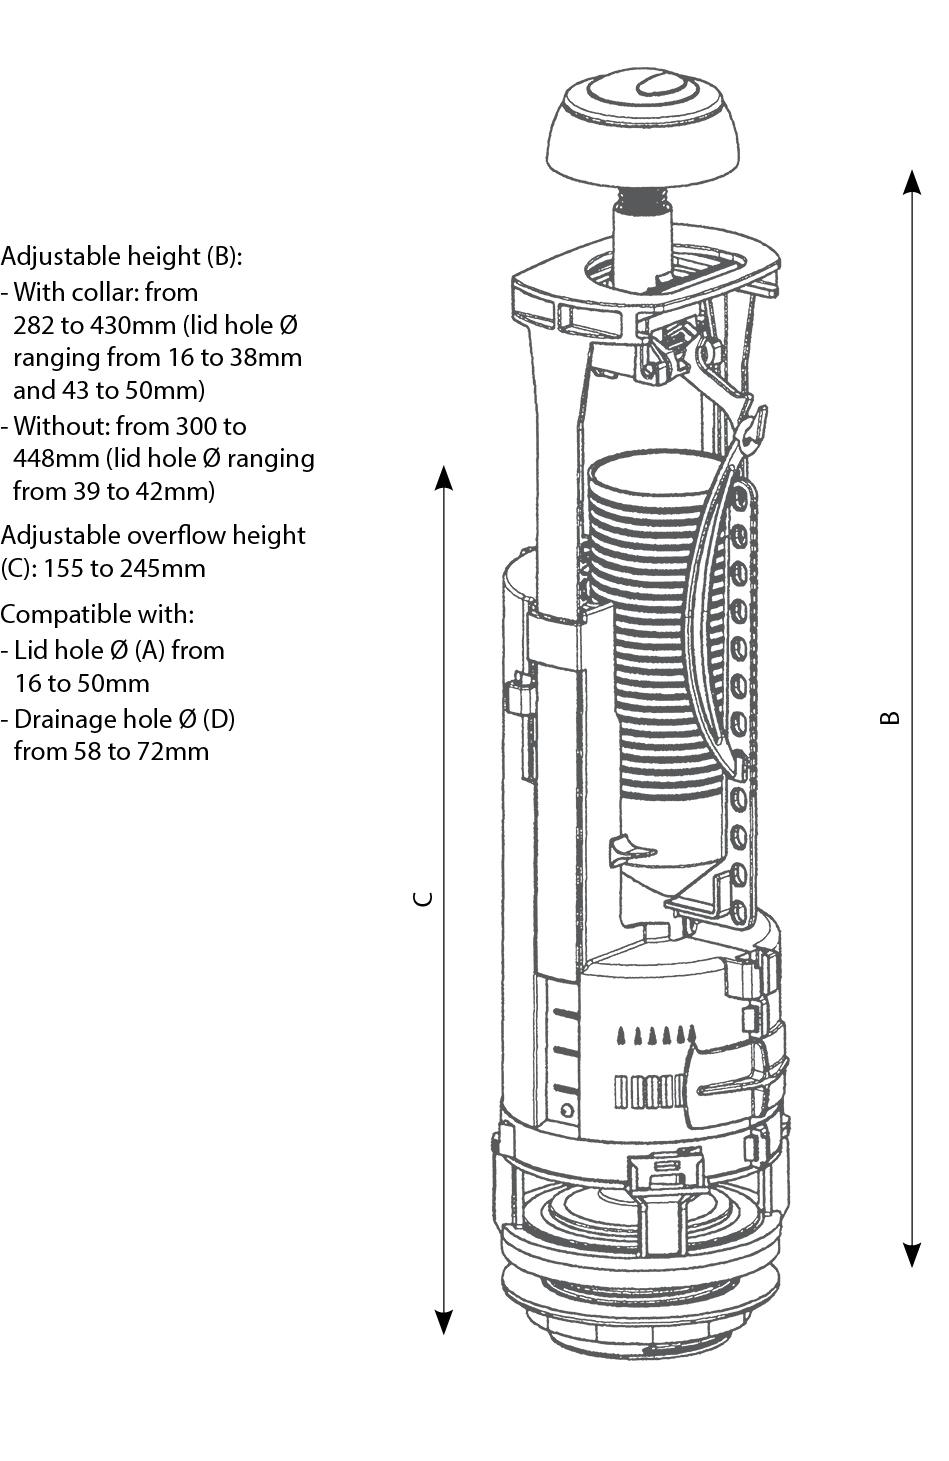 Optima 49 technical drawings